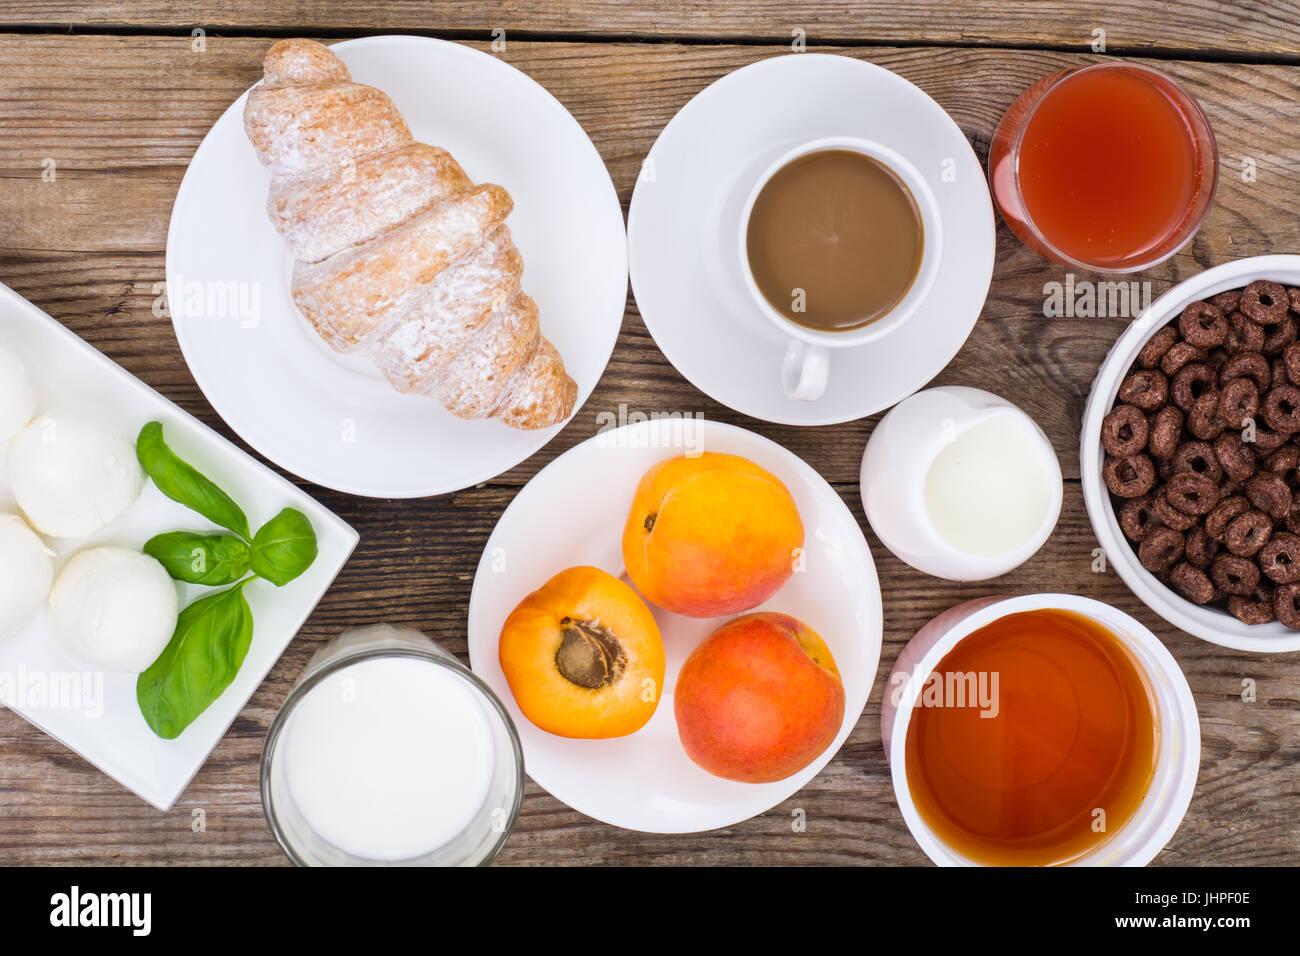 Breakfast table setting with chocolate flakes, mozzarella, juice ...